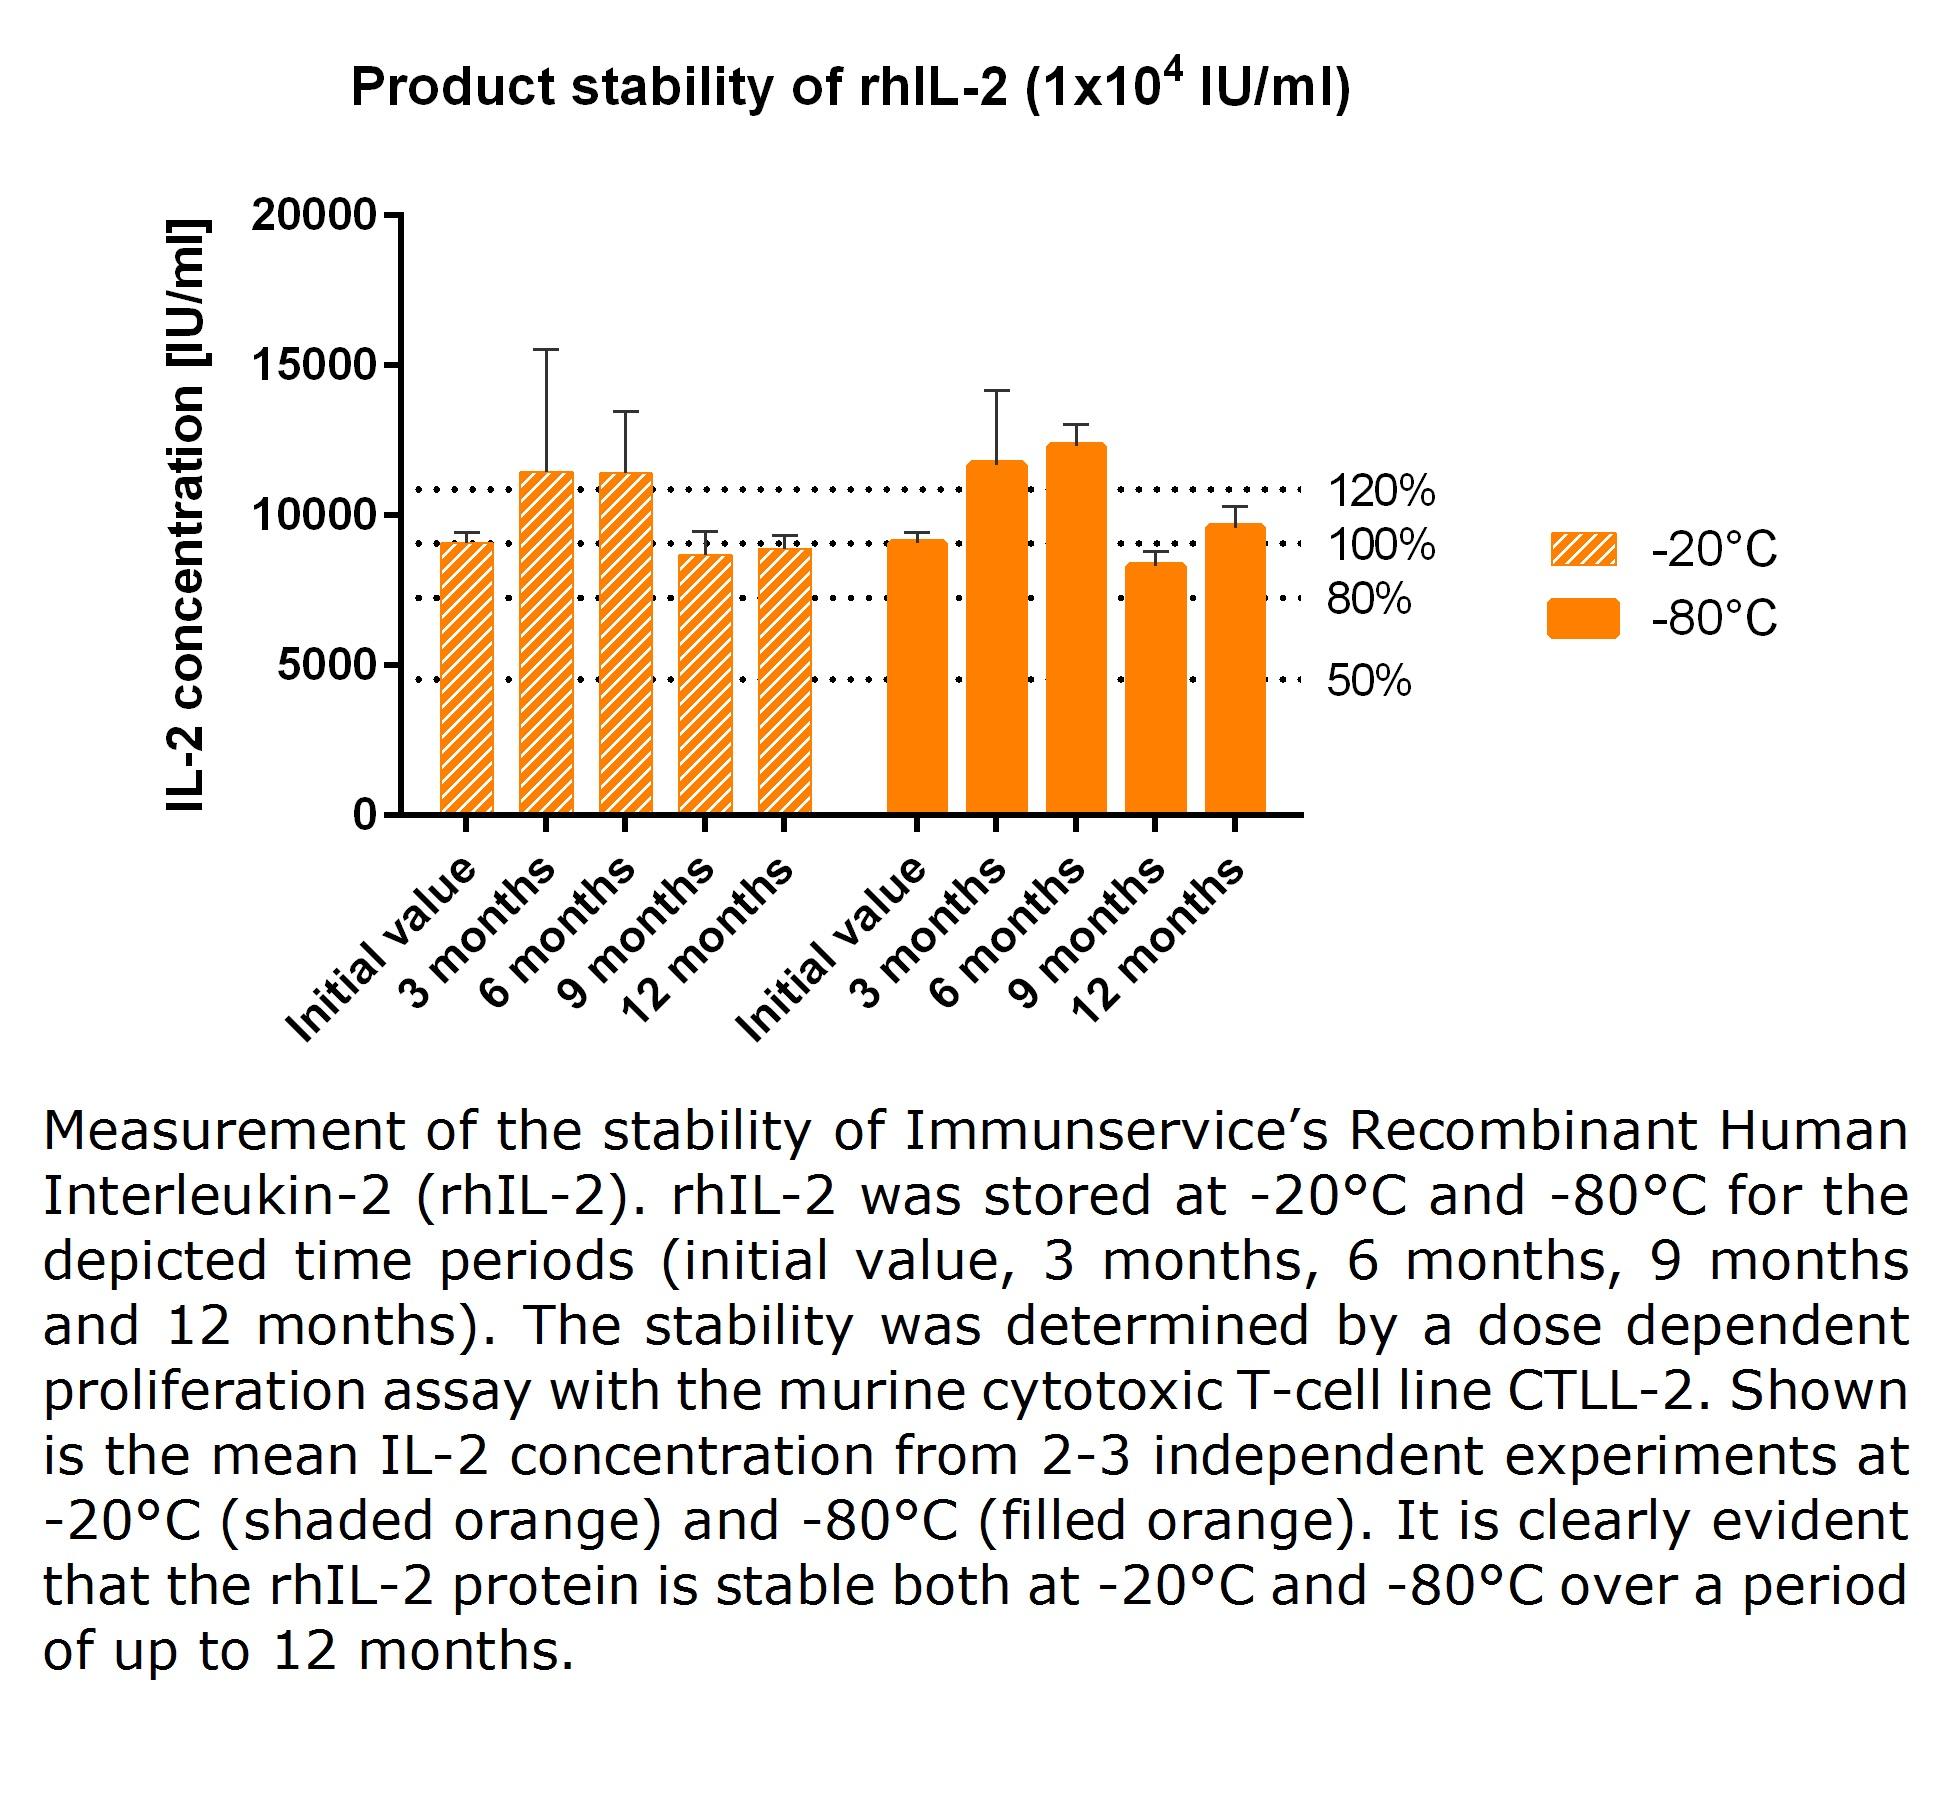 Recombinant human thrombopoietin combined with interleukin